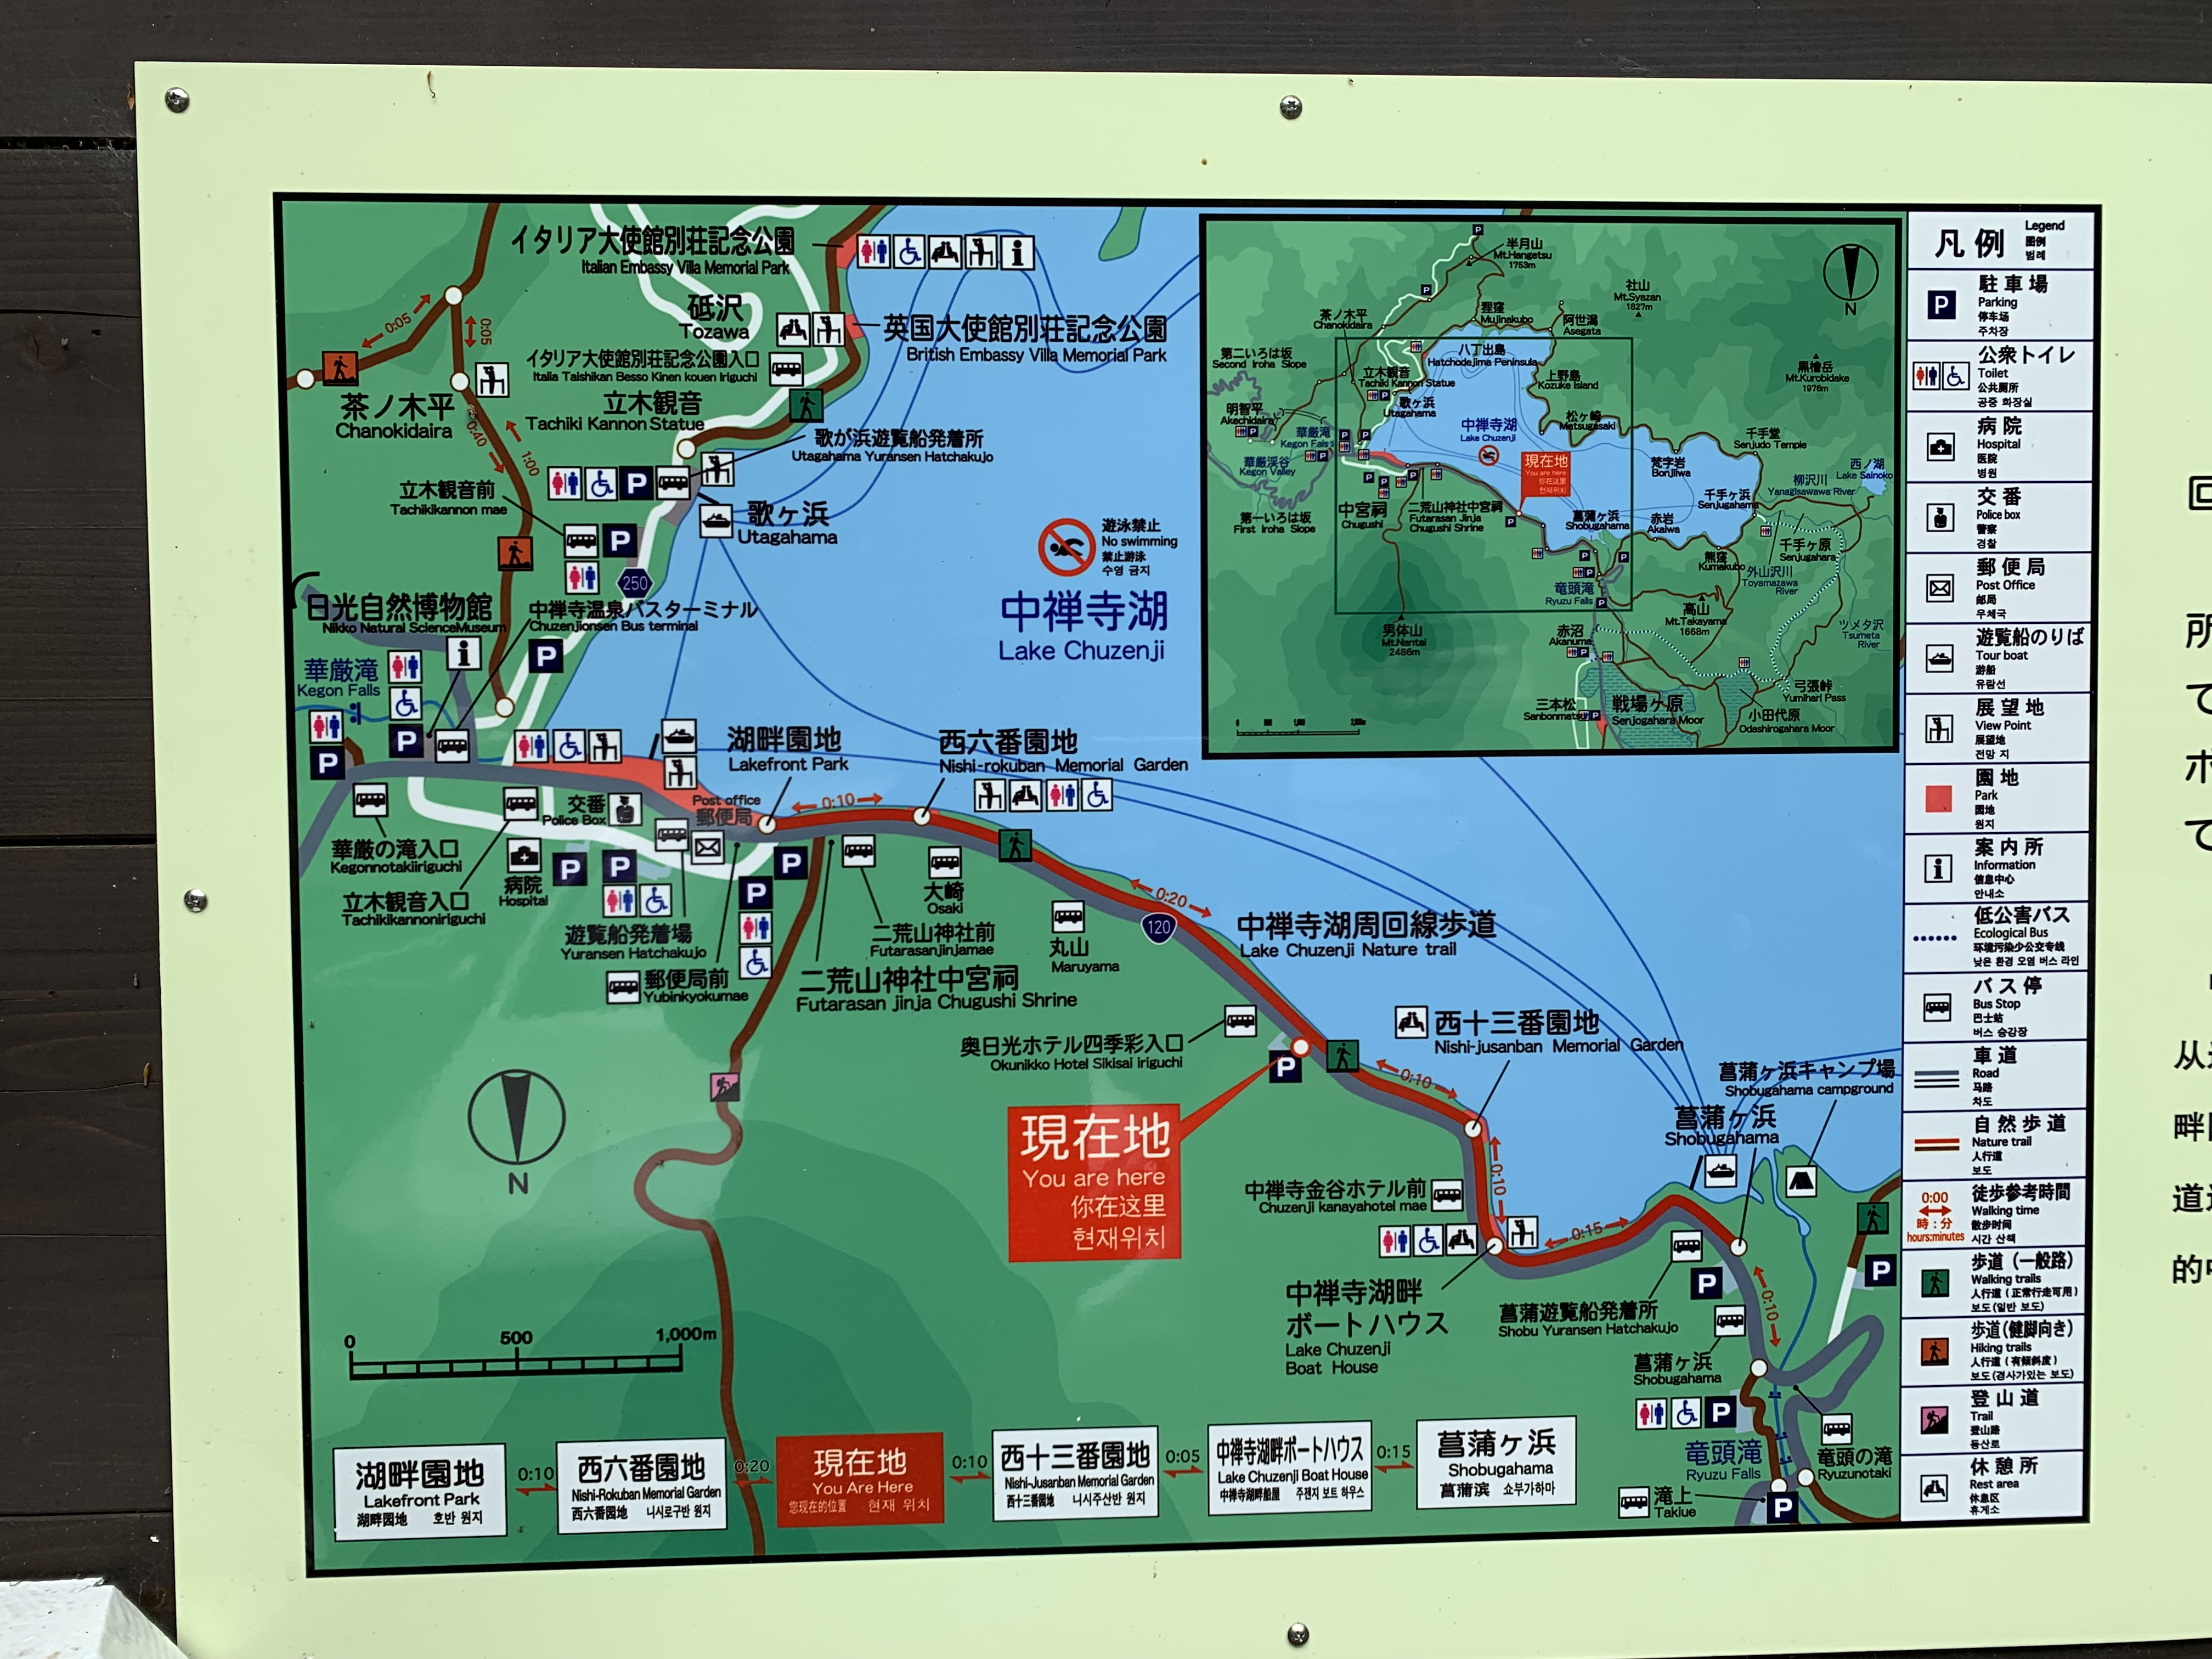 中禅寺湖の案内板